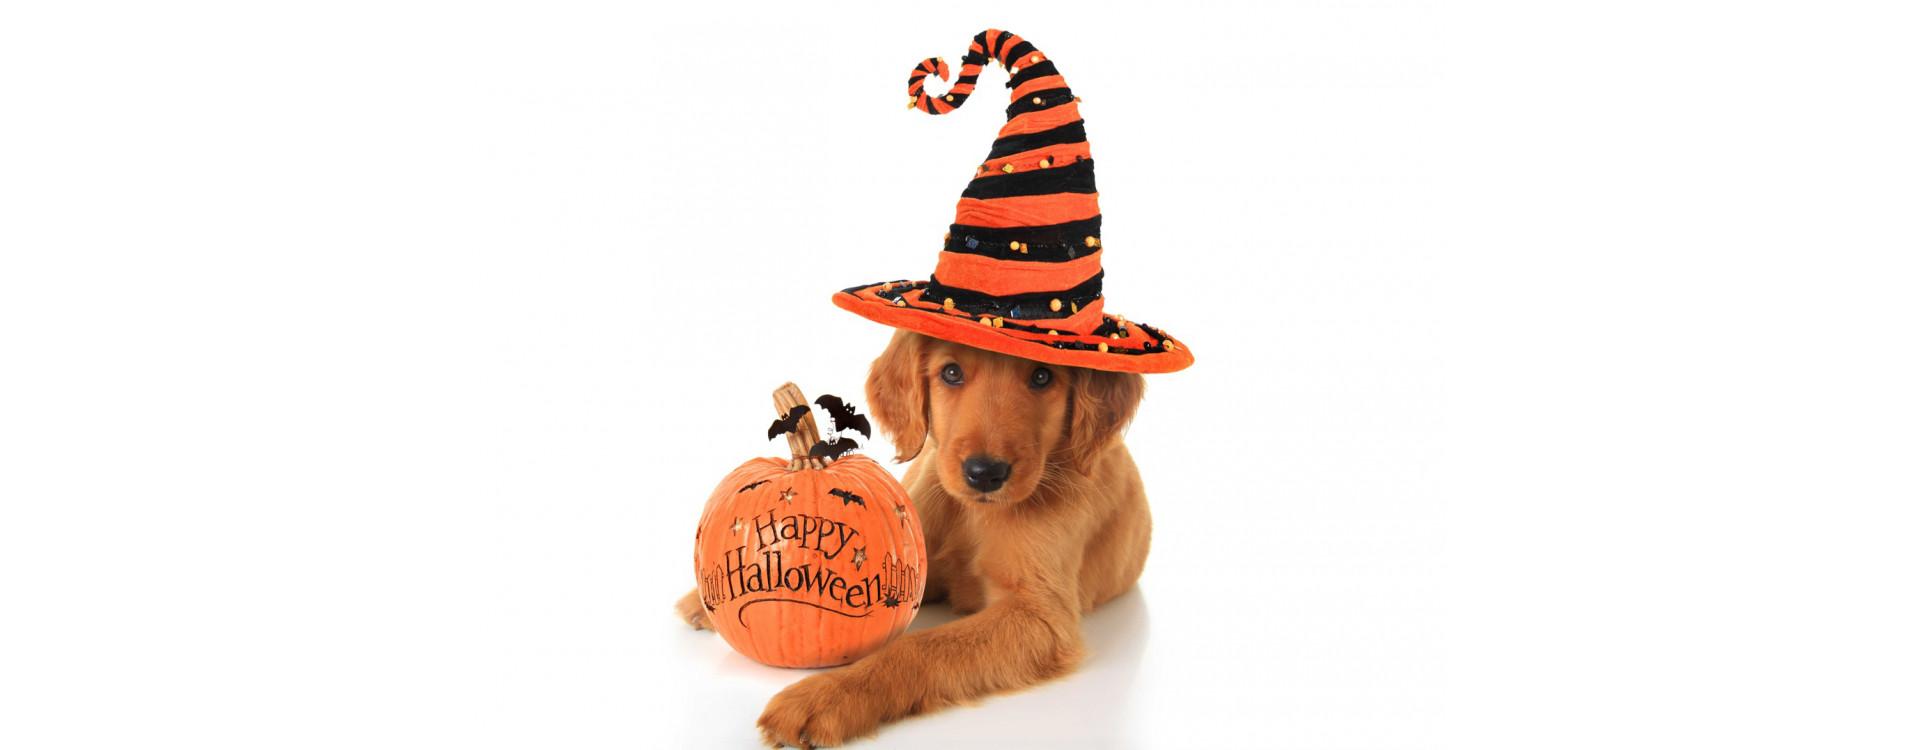 Venez fêter Halloween en magasin le samedi 31 octobre